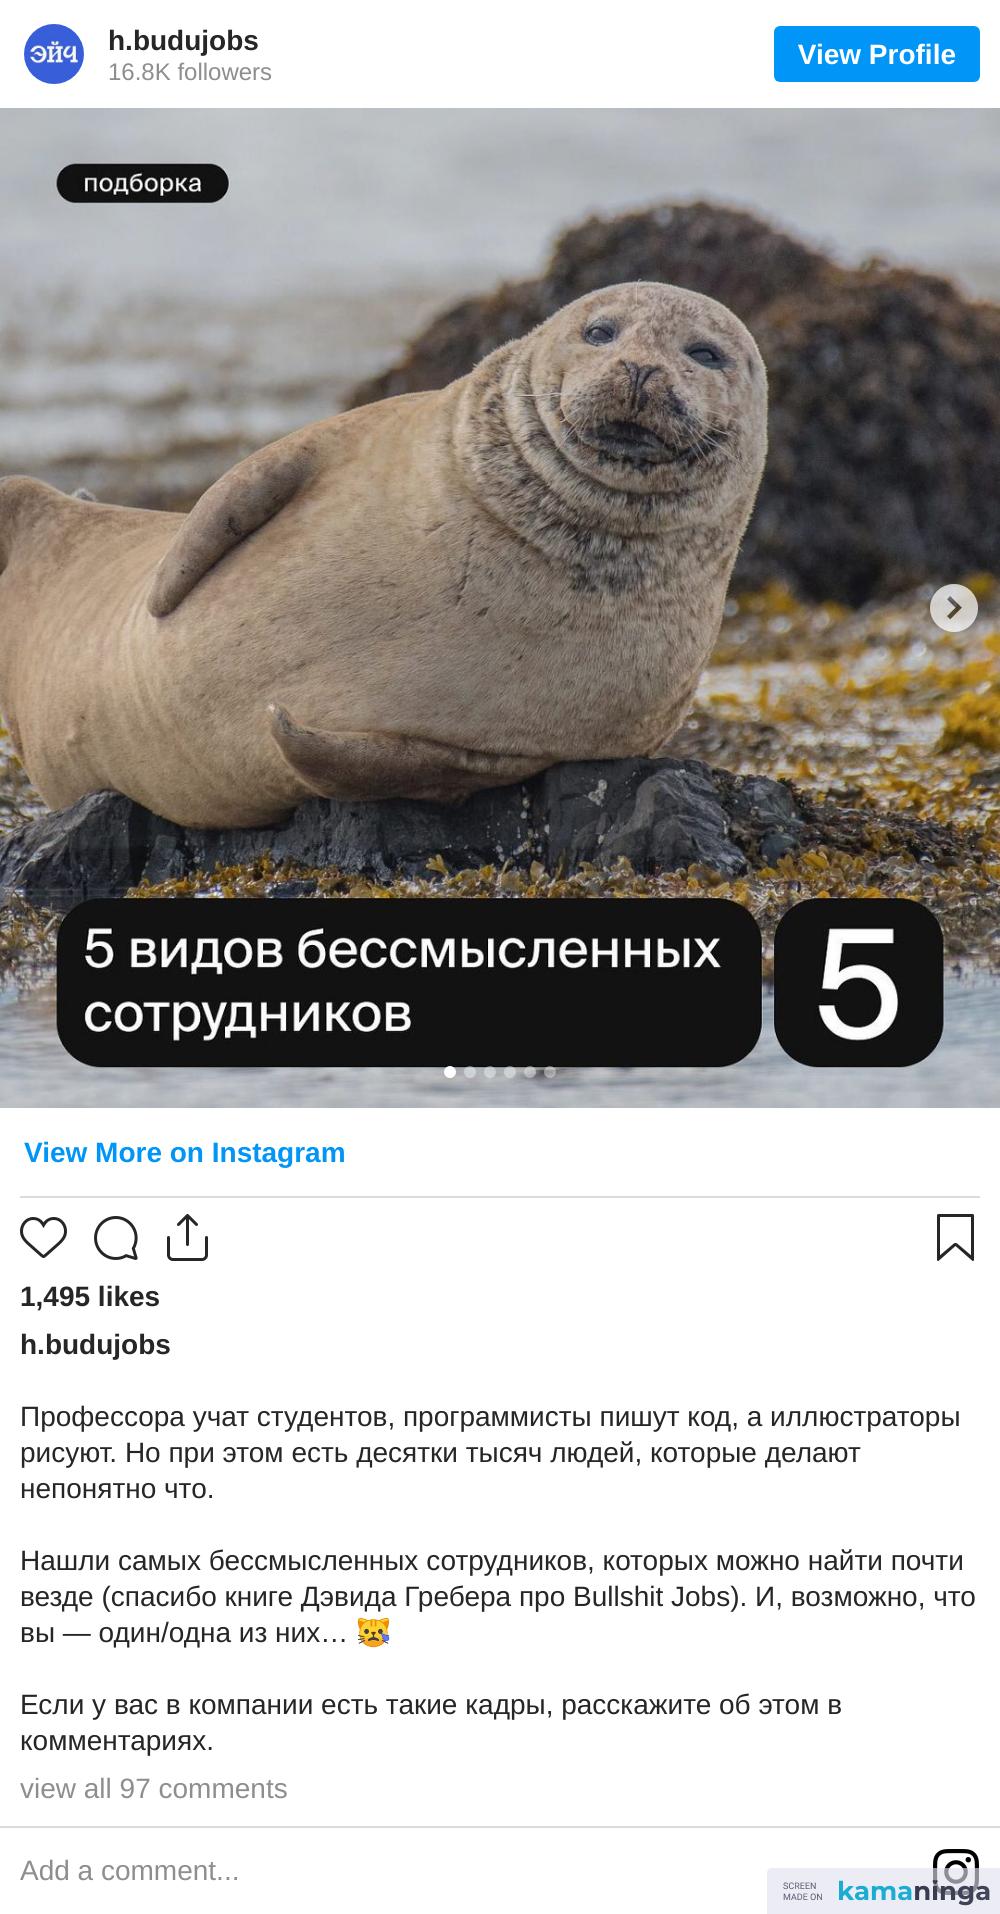 https://www.instagram.com/p/CQv-xaZrx7j/